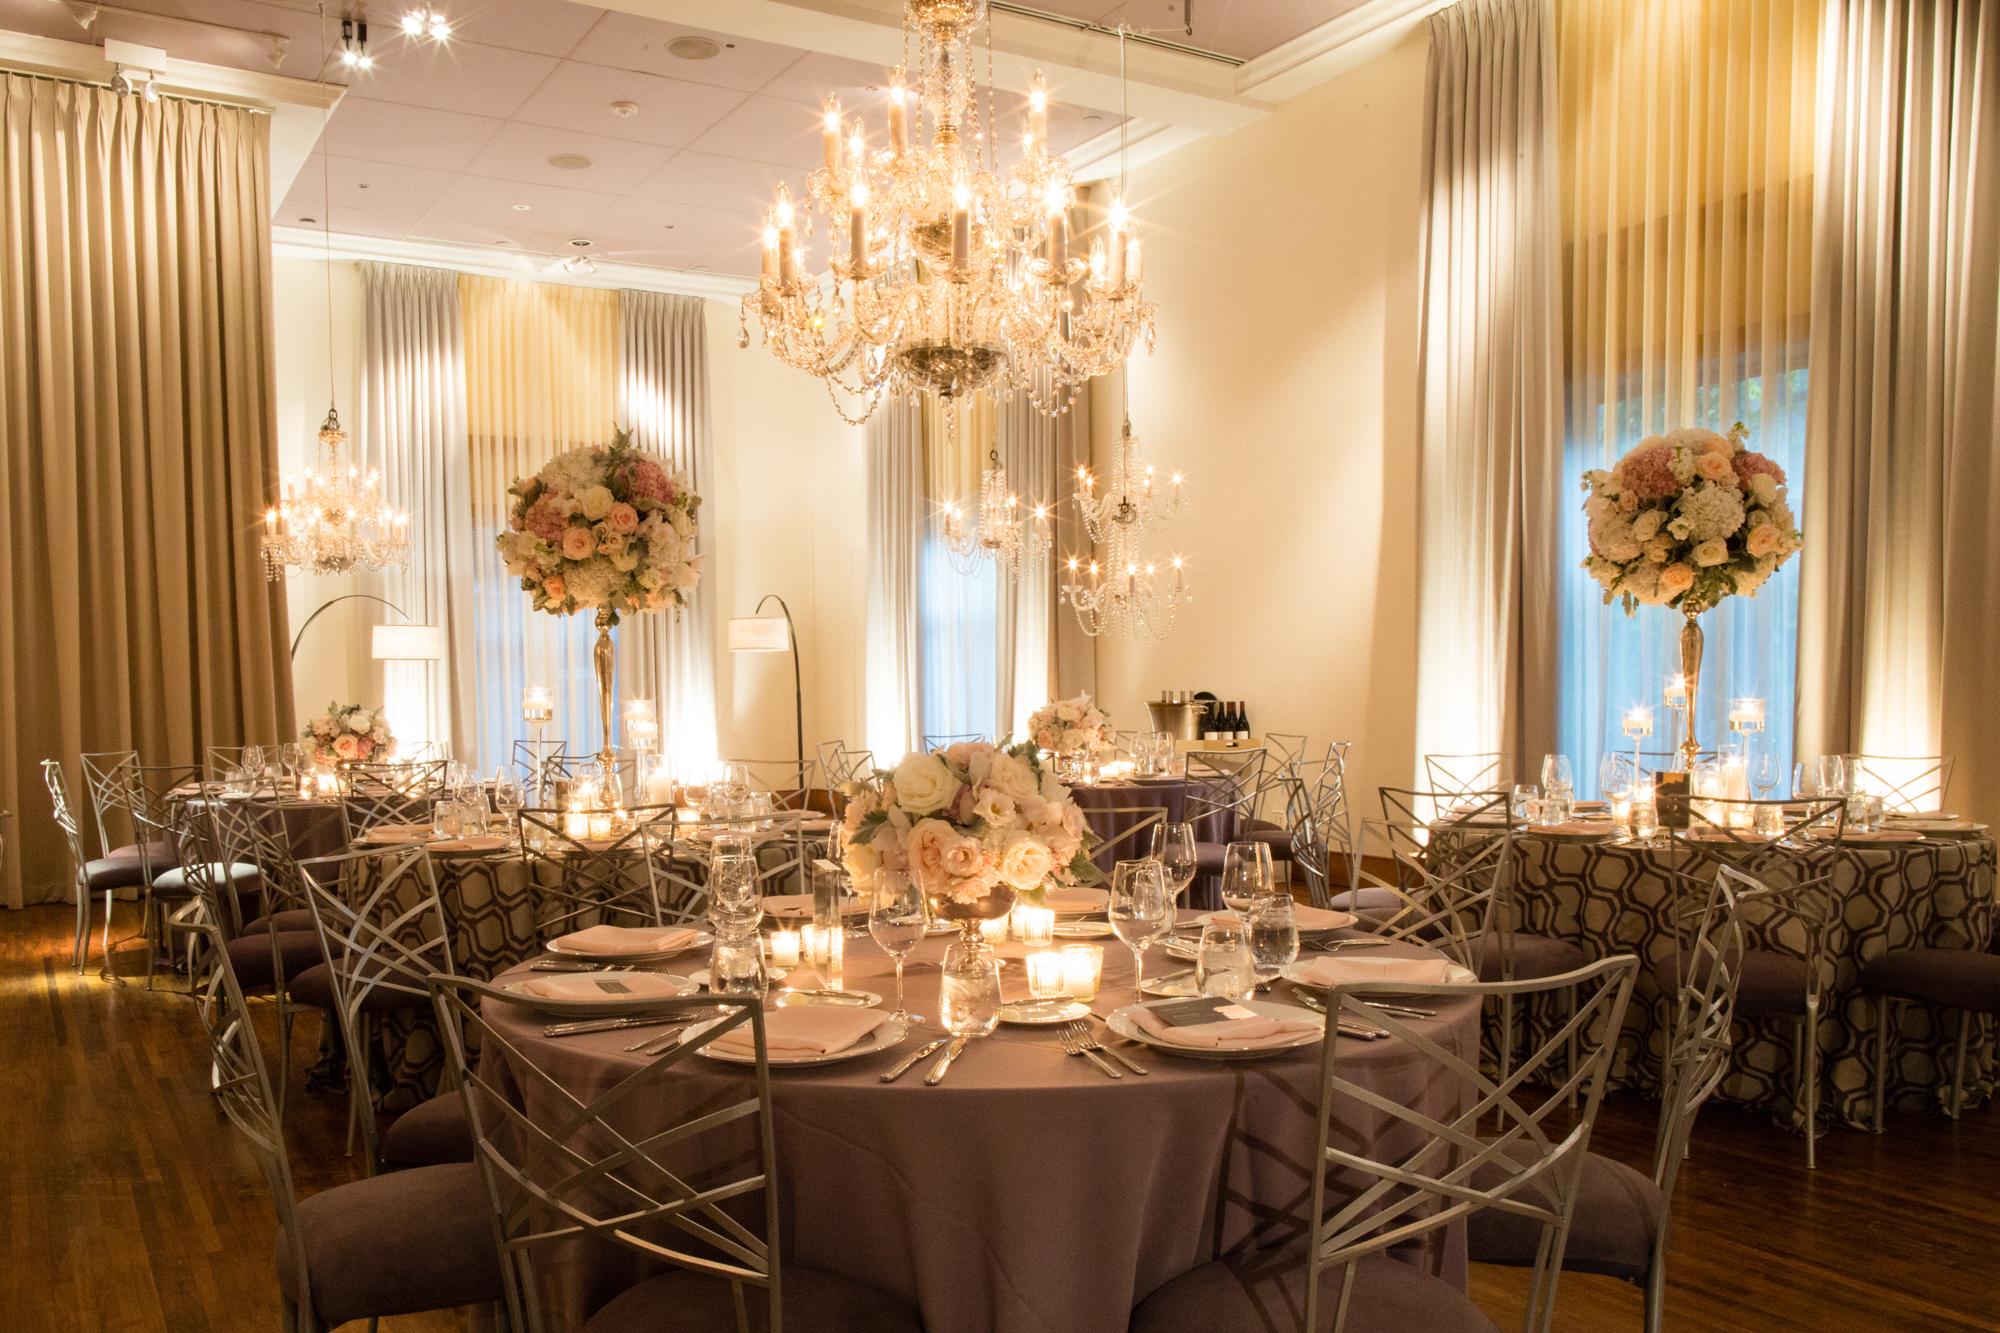 Wedding Reception at Ivy Room Chicago by HMR Designs